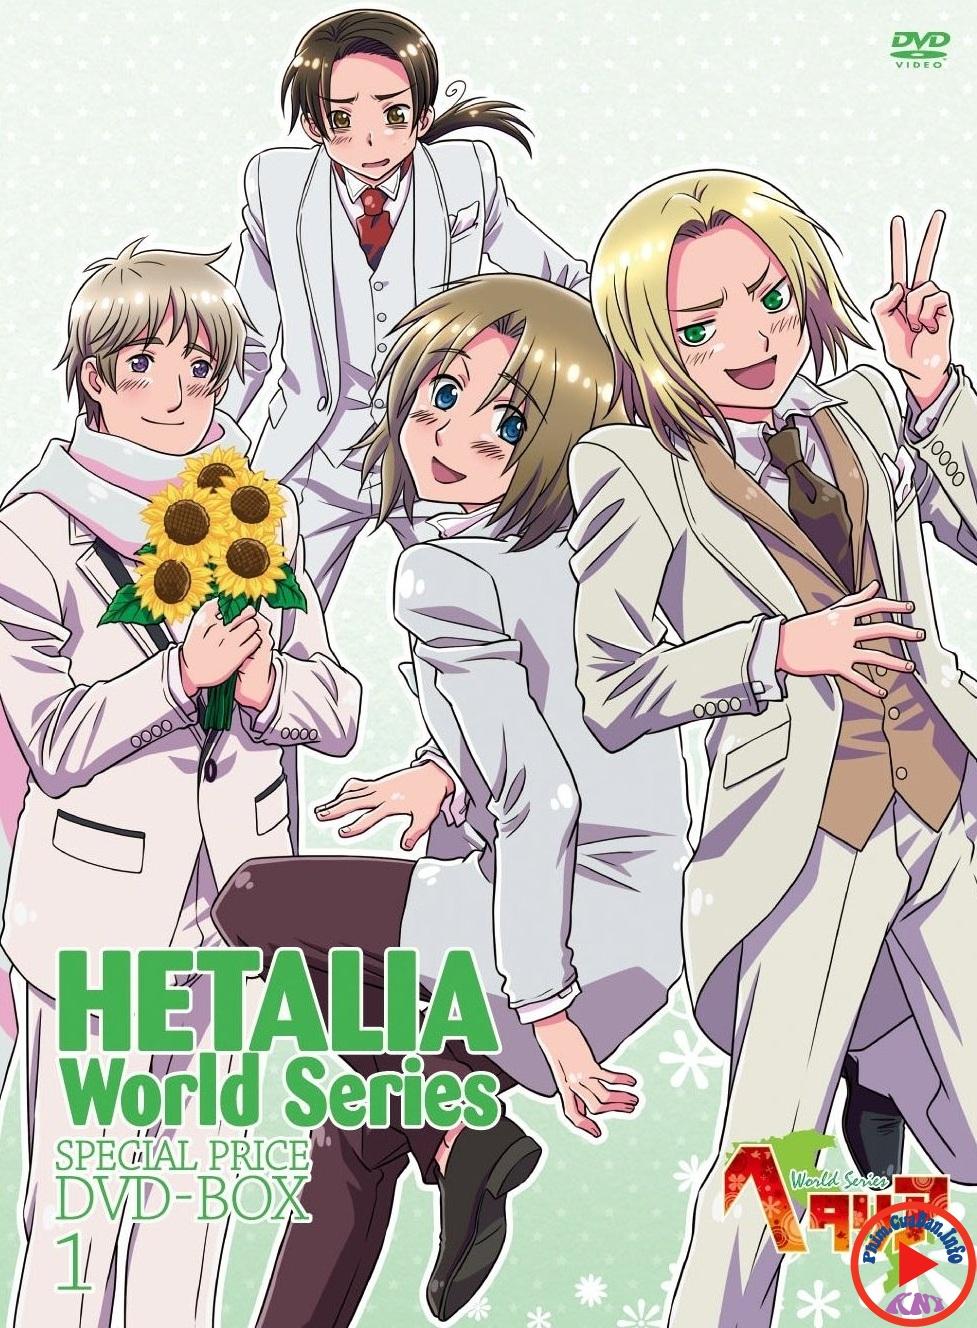 Hetalia World Series Extra Episodes - Hetalia World Series Extra Episodes   Hetalia World Series Specials   Hetalia=Fantasia